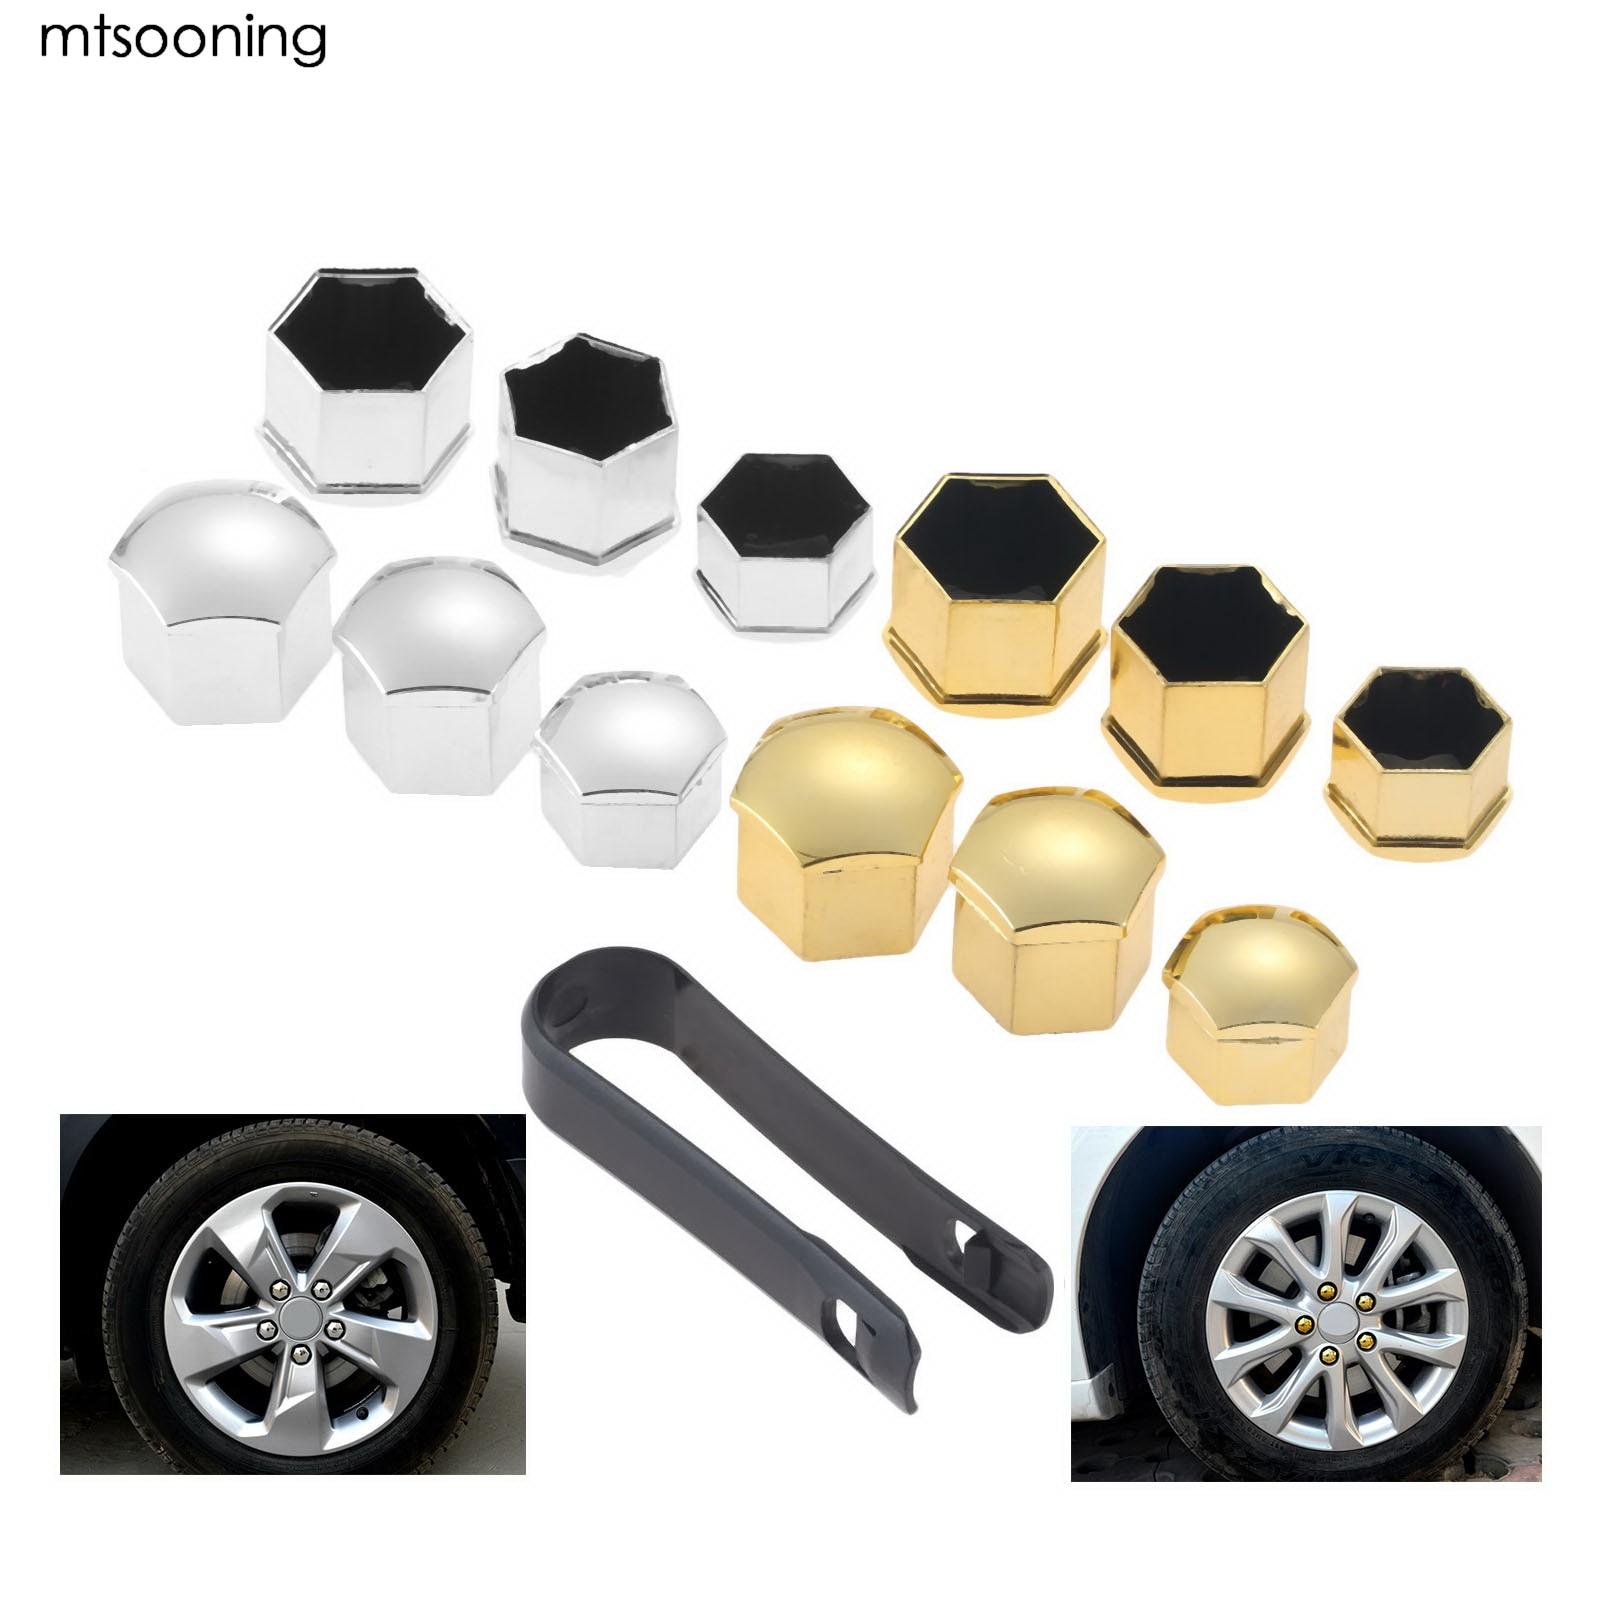 20 x 21MM HEX ALLOY WHEEL NUT BOLT CAPS BLACK Removal Tool Toyota Rav 4